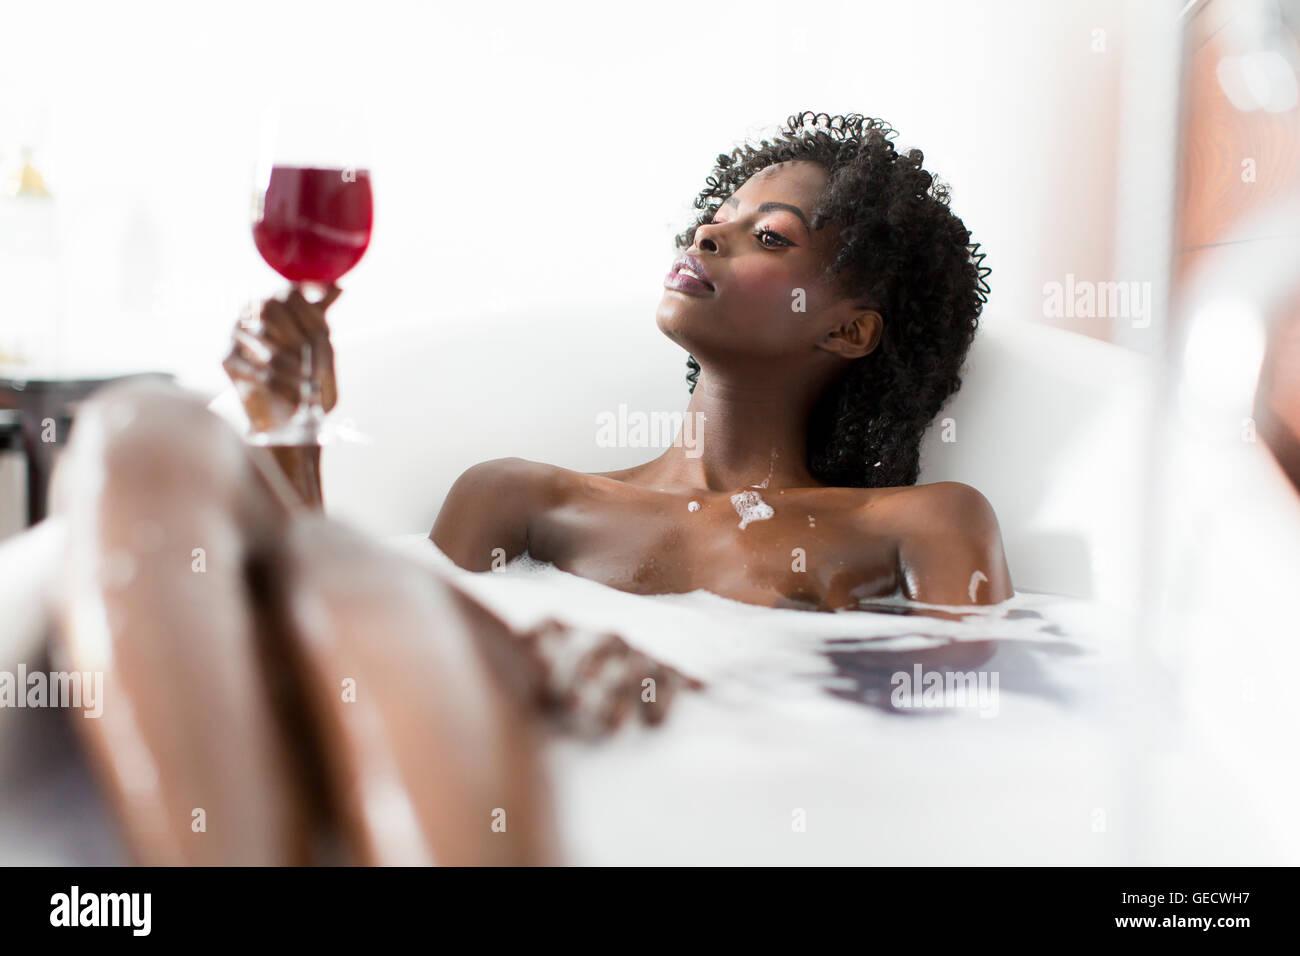 Pretty Young Black Woman Having A Foam Bath In The Room